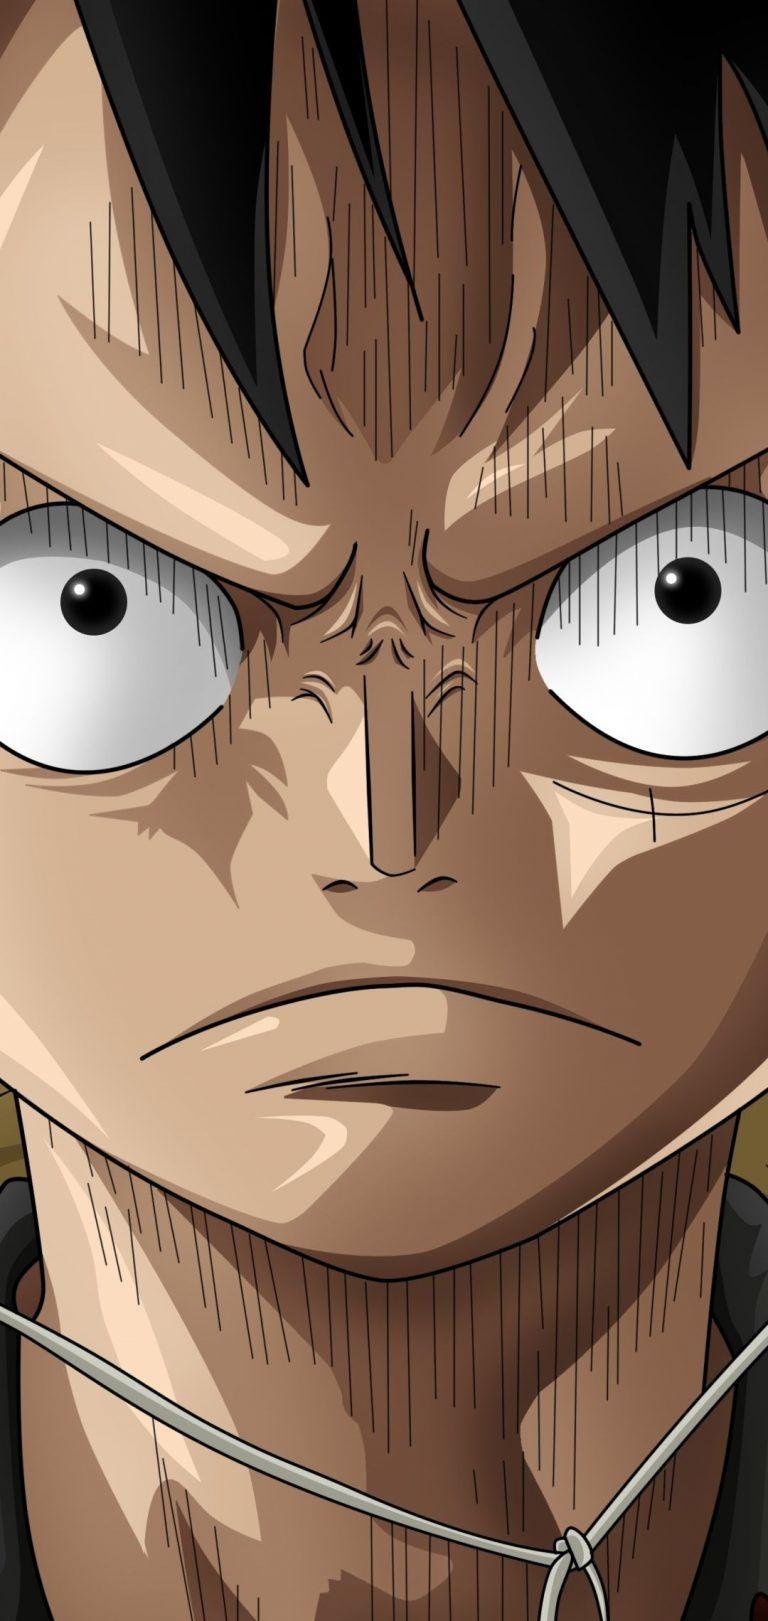 Fond D Ecran One Piece Hd Et 4k A Telecharger Gratuit En 2020 Fond D Ecran Telephone Fond Ecran Fond D Ecran Dessin